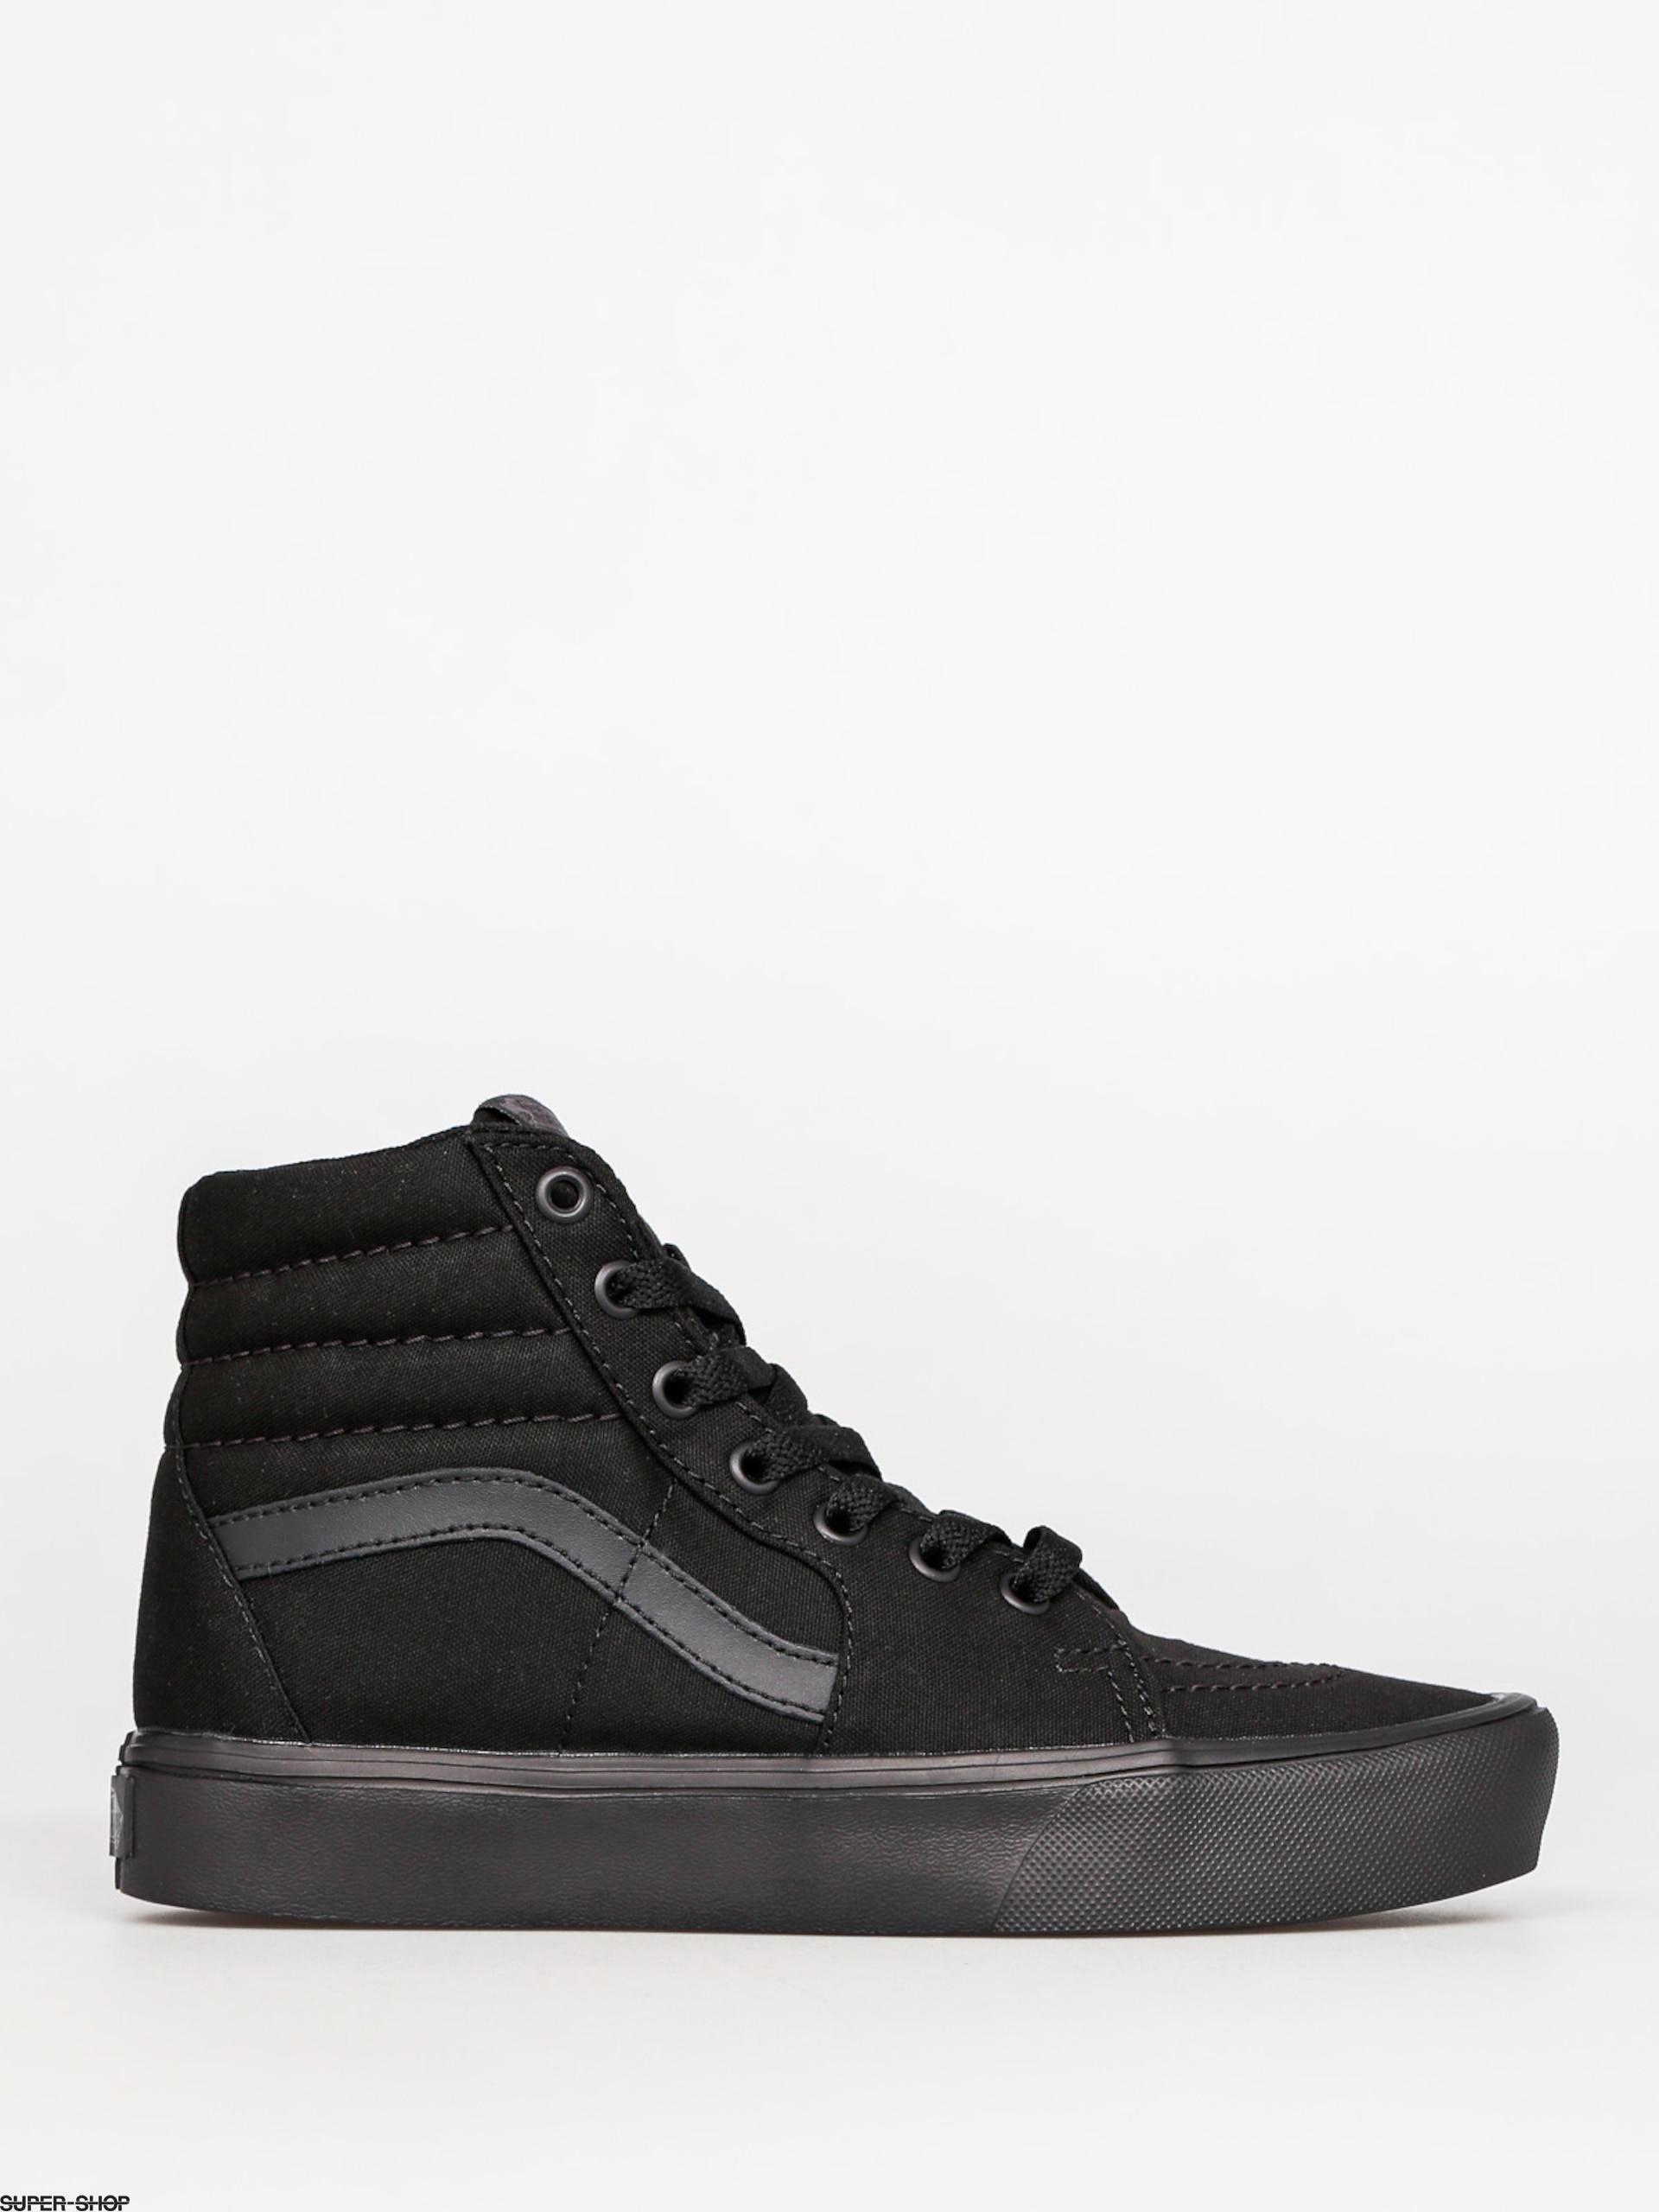 0a40b9c2e43 831579-w1920-vans-shoes-sk8-hi-lite-canvas-black-black.jpg